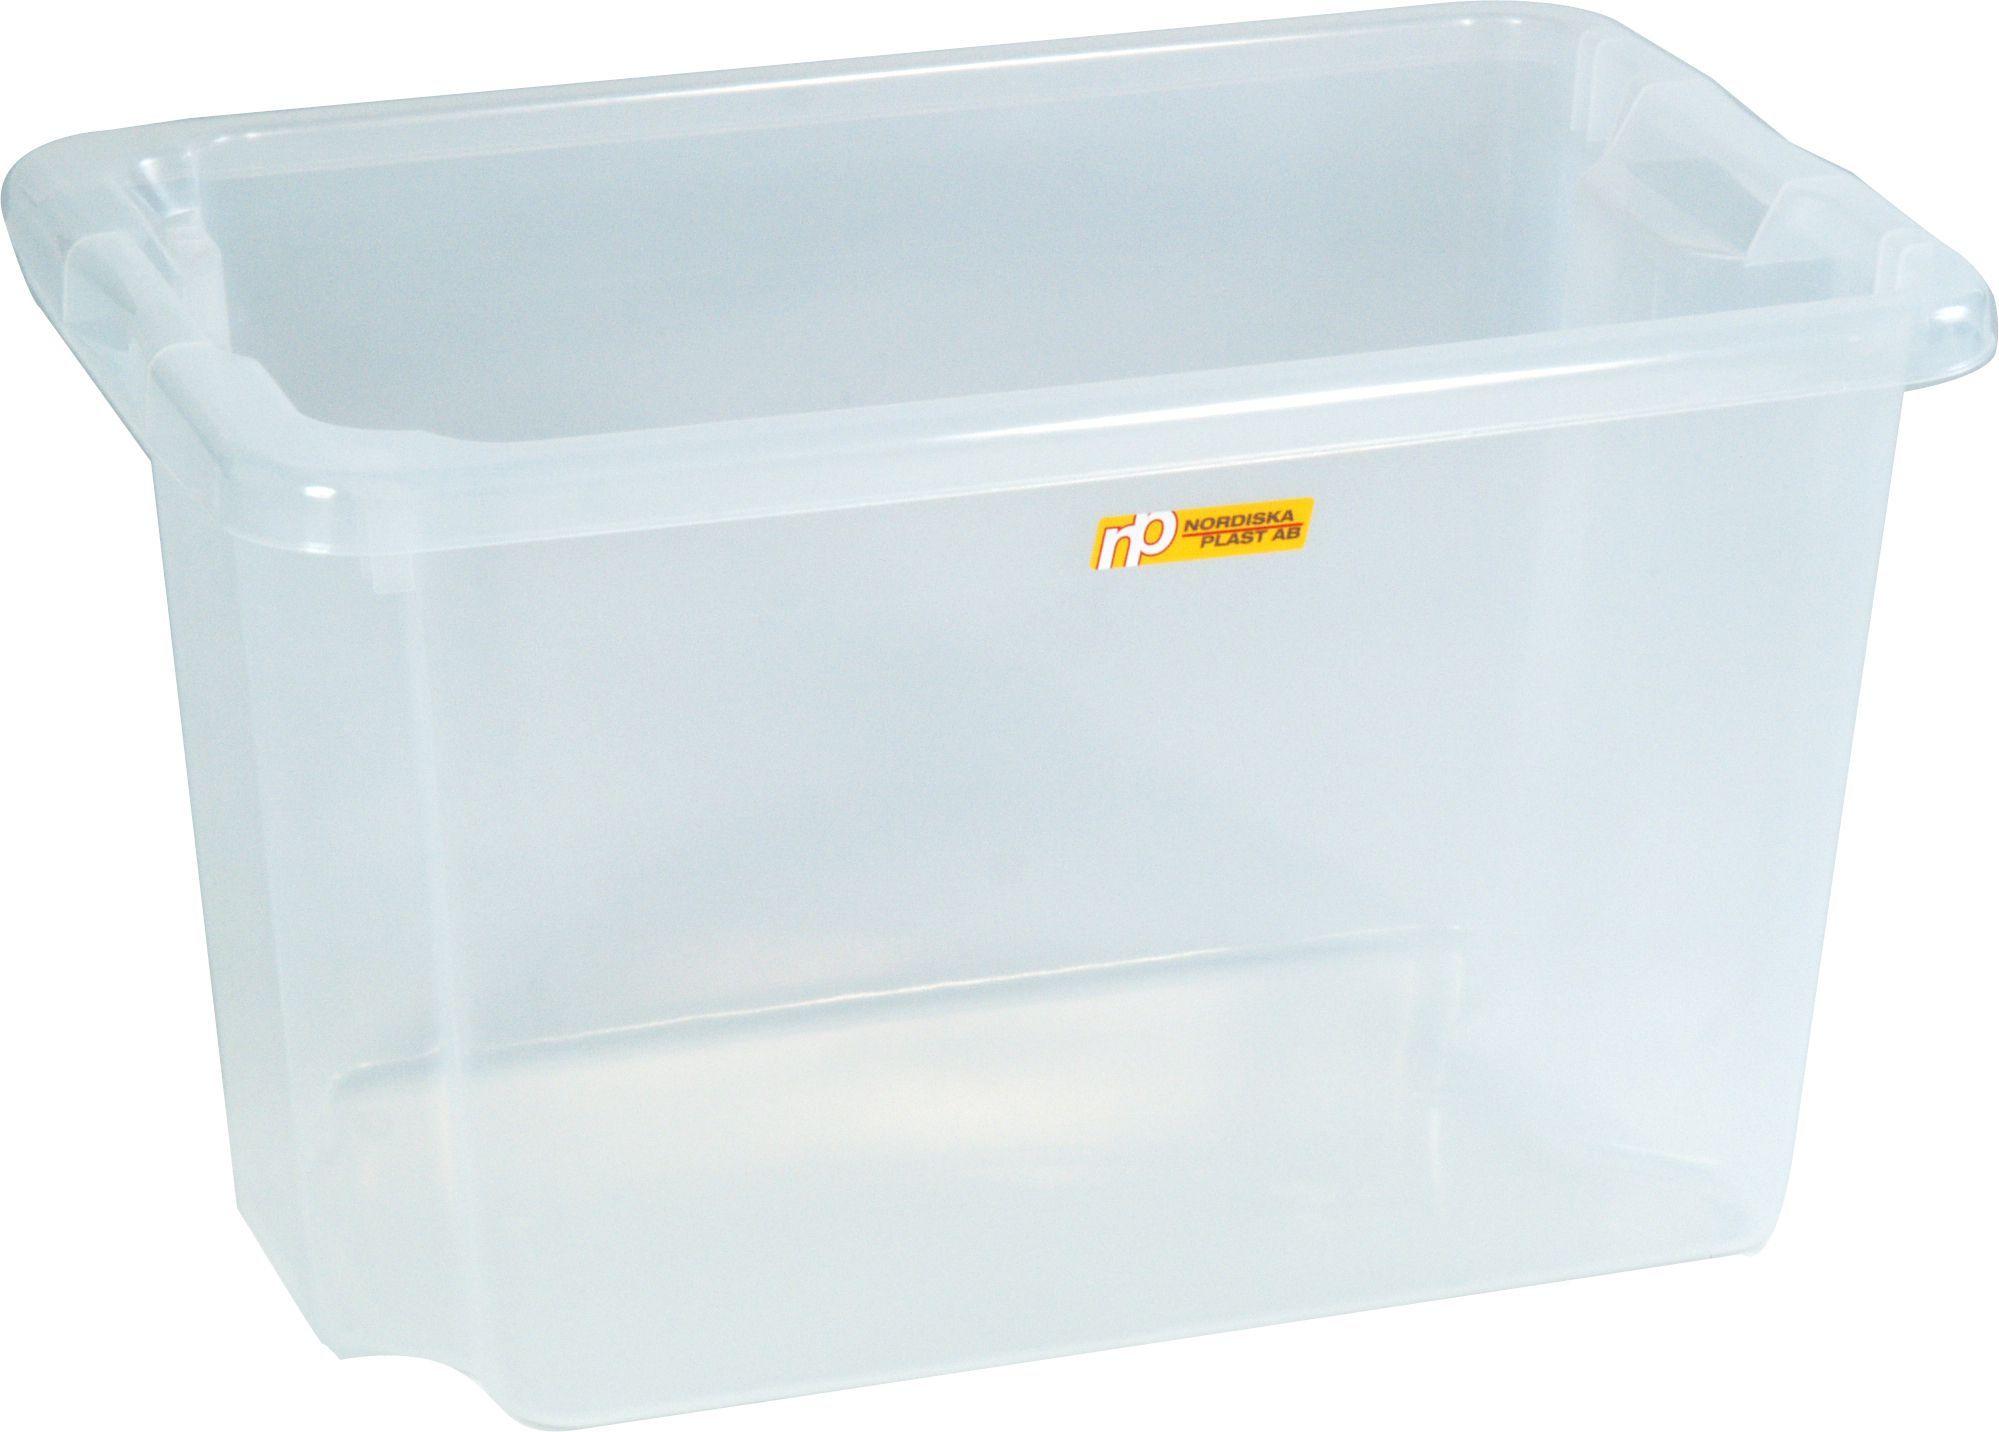 Oppbevaringsboks 55L transparent plast 75500500